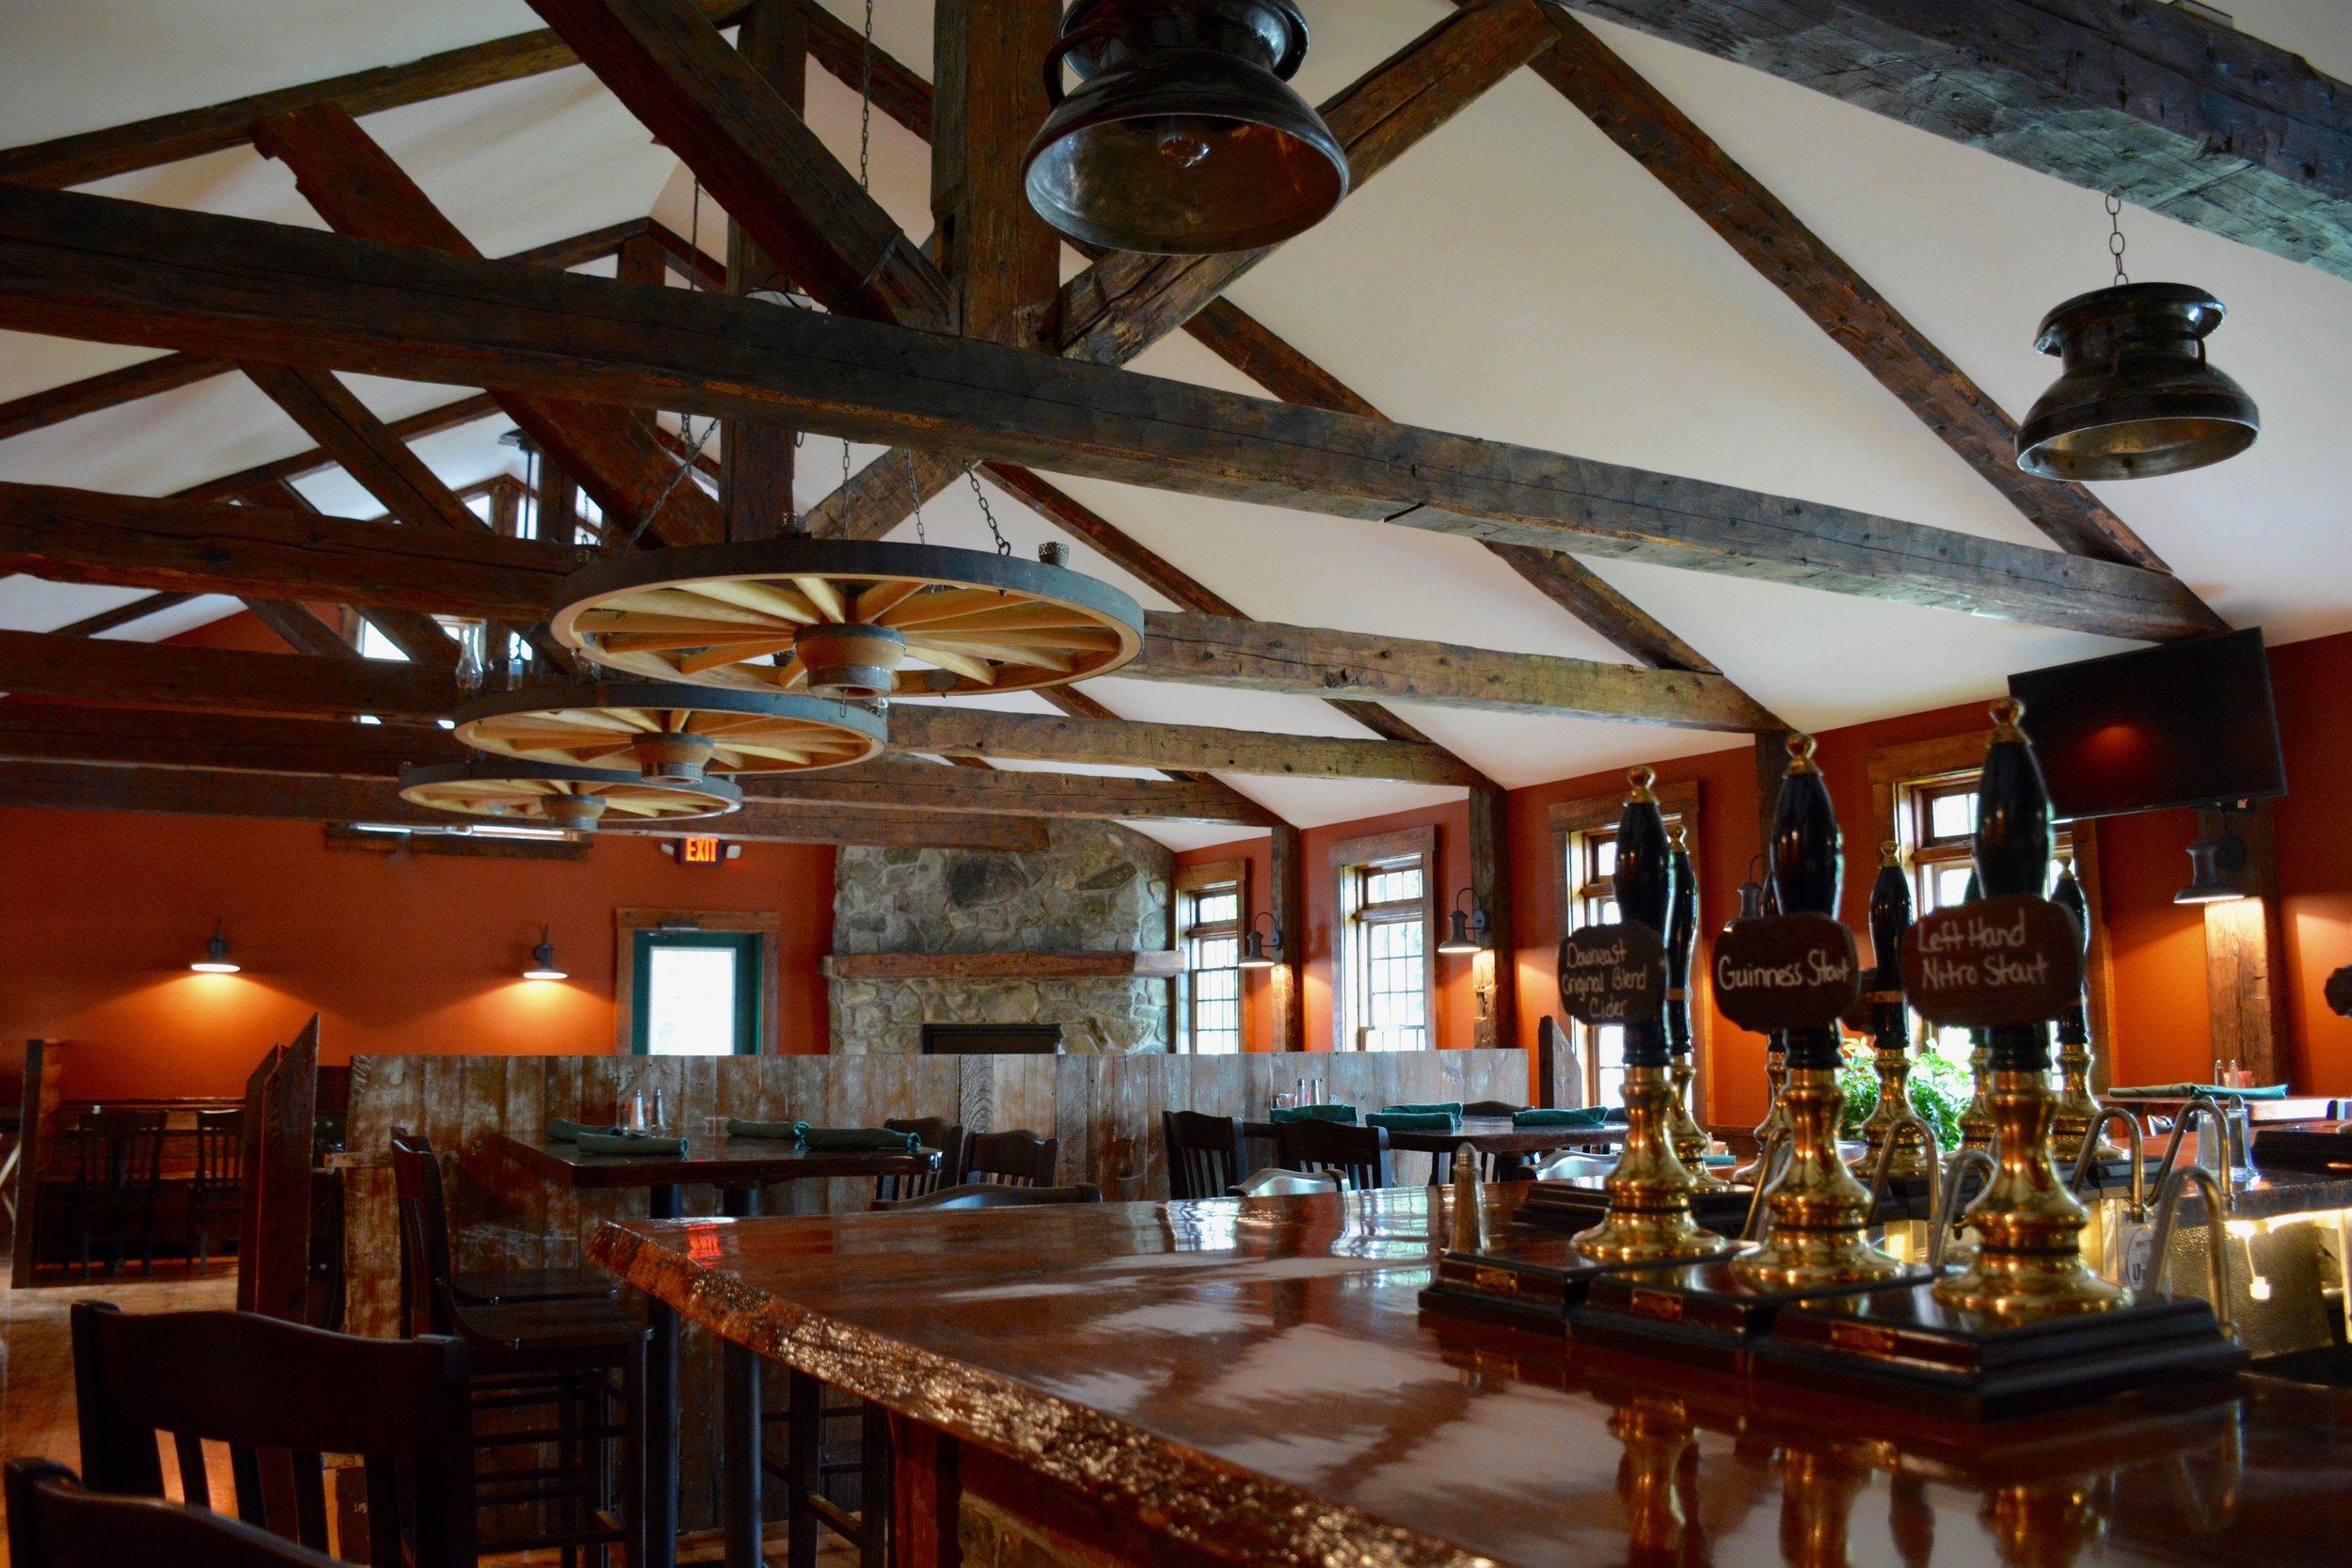 The Latham House Tavern